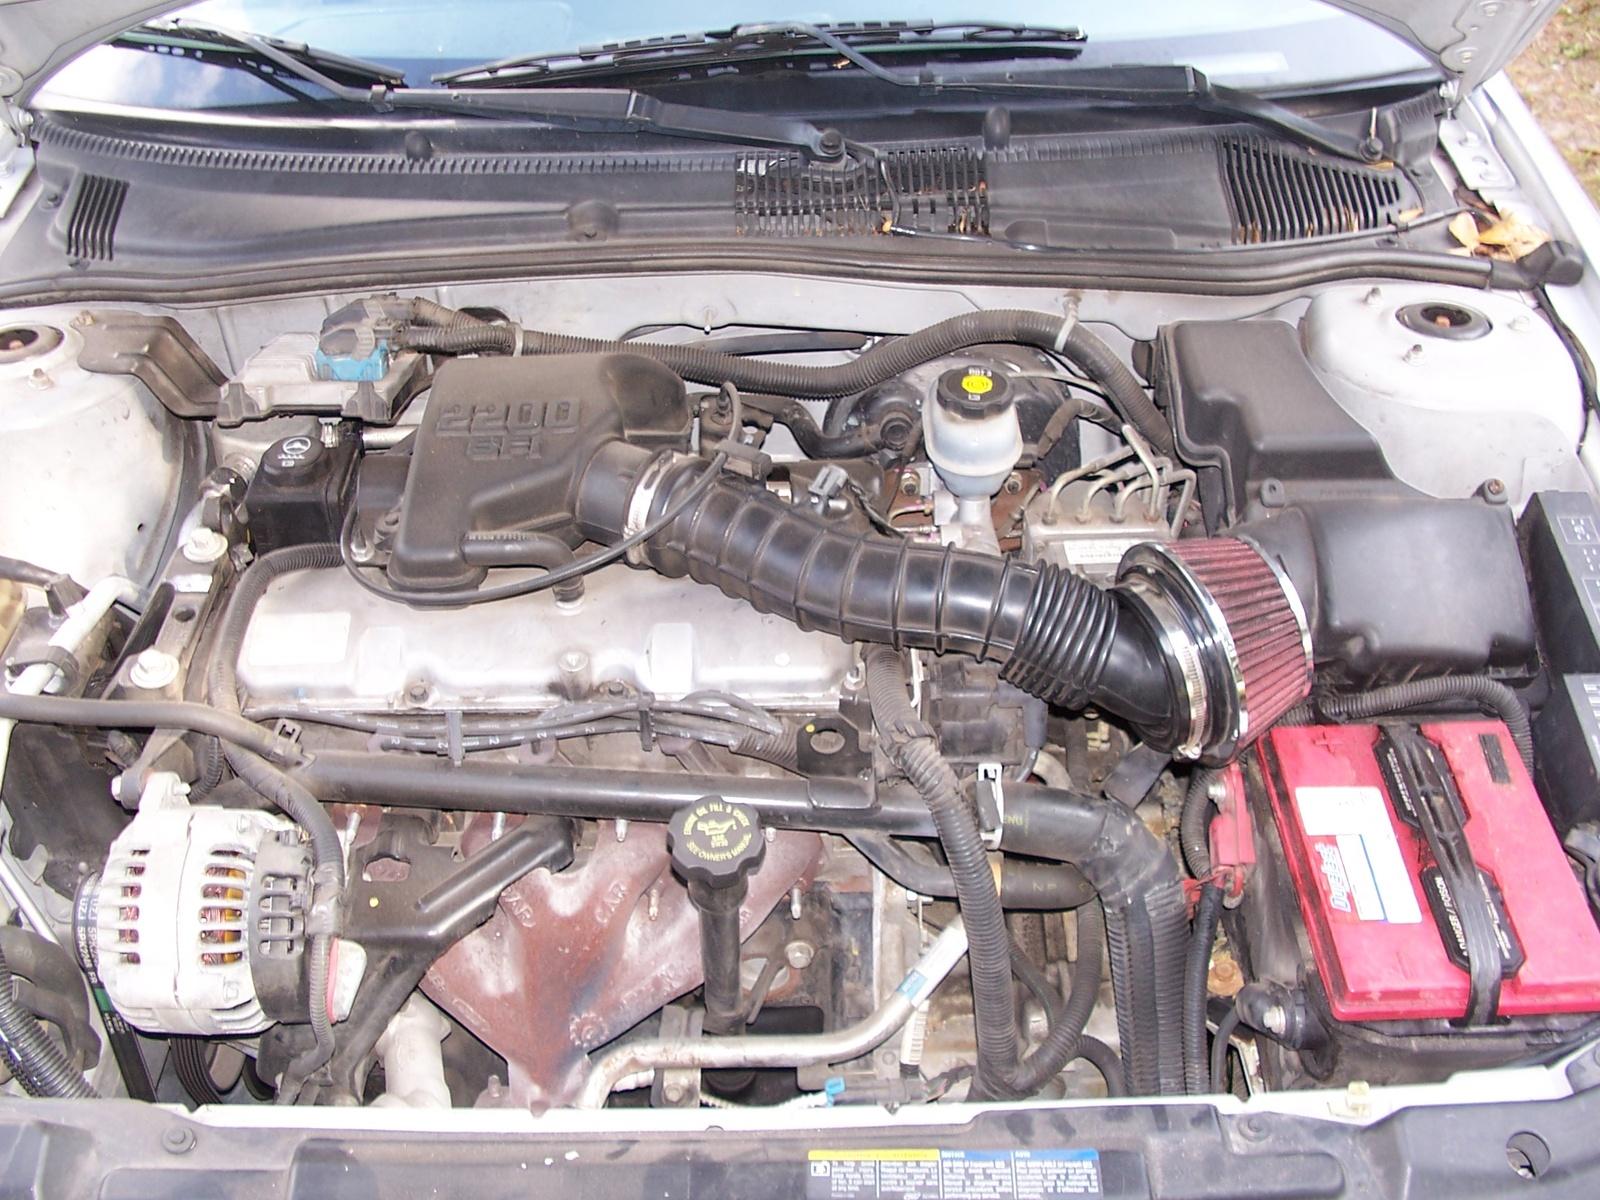 2000 Chevy Cavalier Engine Diagram Car Tuning